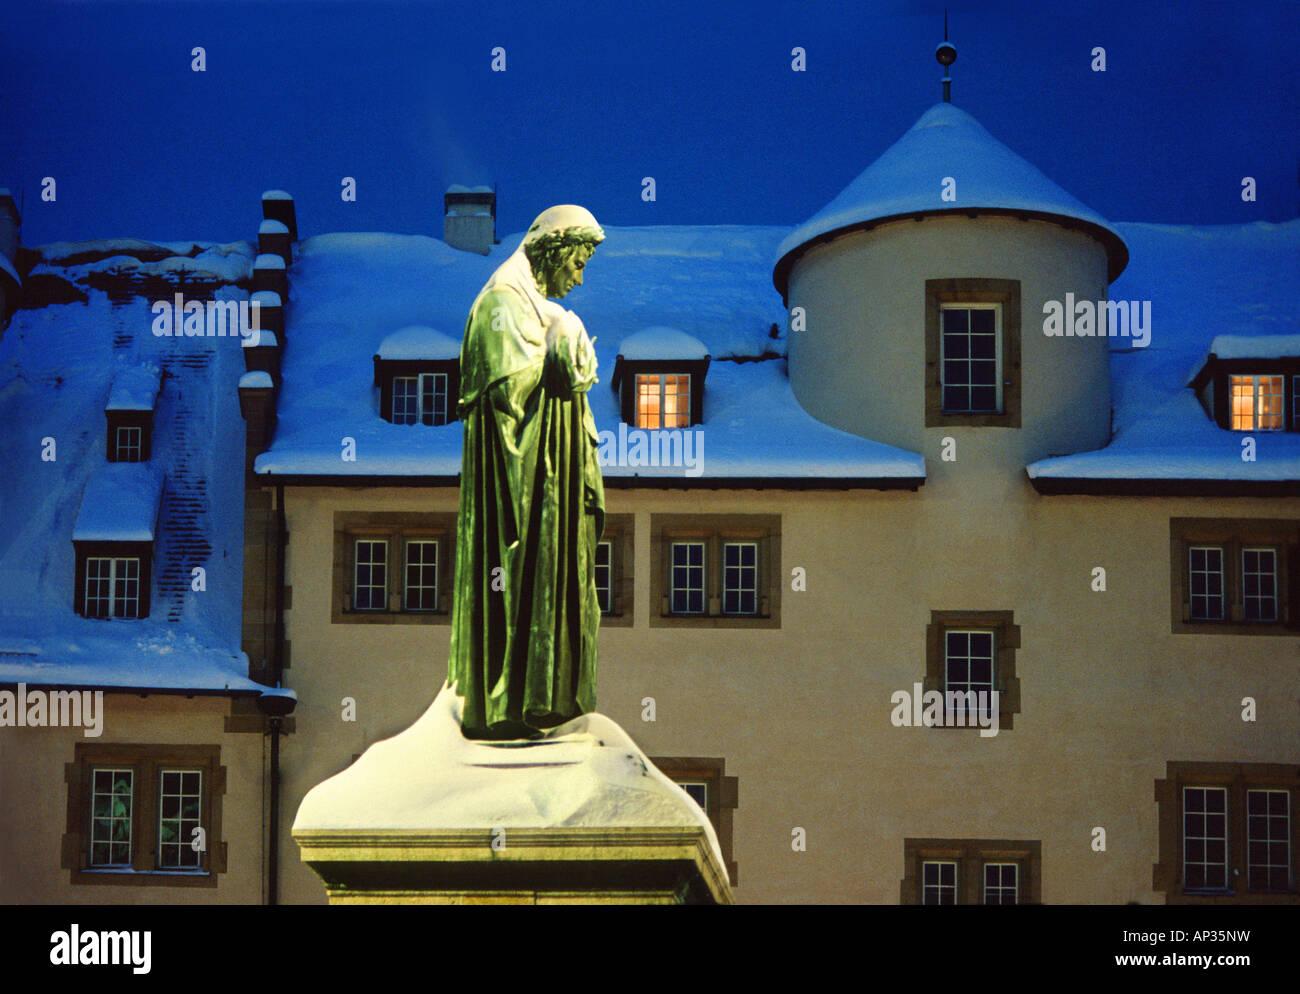 Schiller statue in snow, Schillerplatz, Stuttgart, Baden Wuerttemberg, Germany, Europe - Stock Image